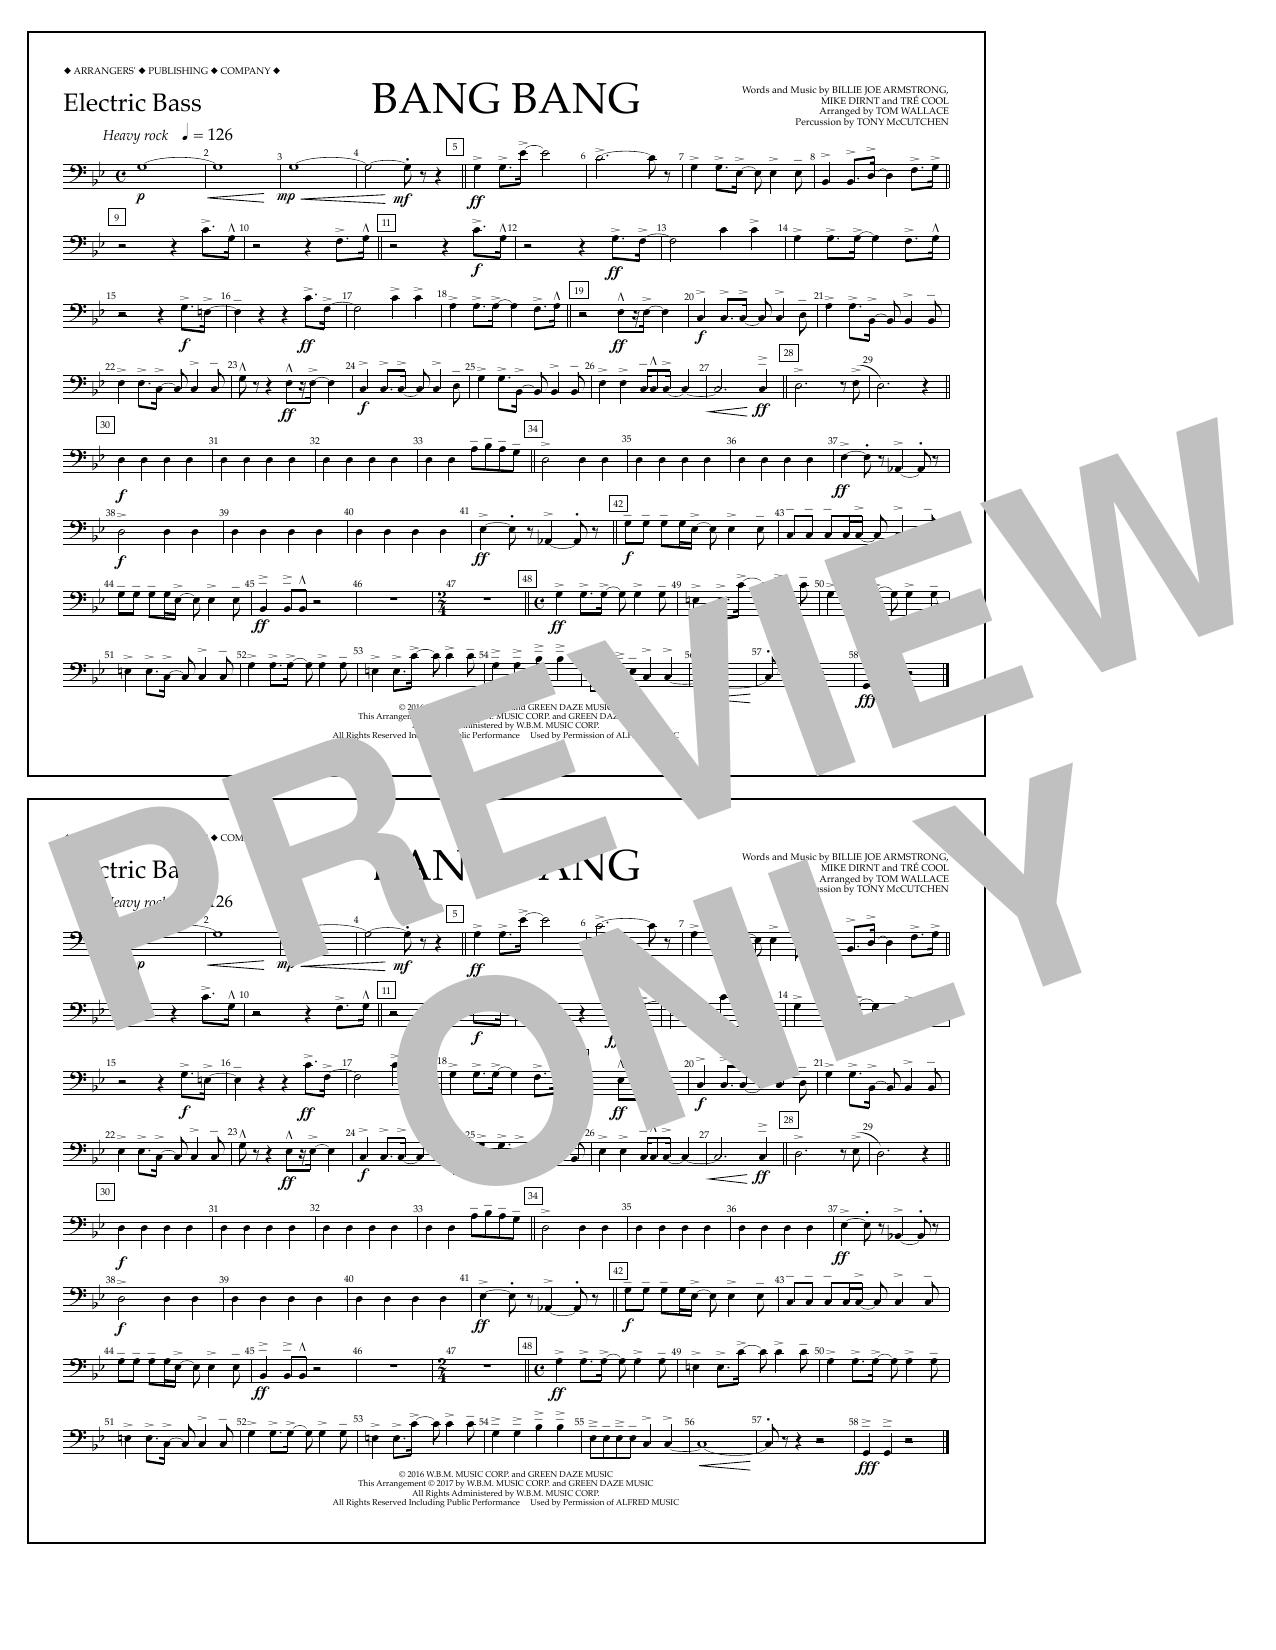 Bang Bang - Electric Bass Digitale Noten